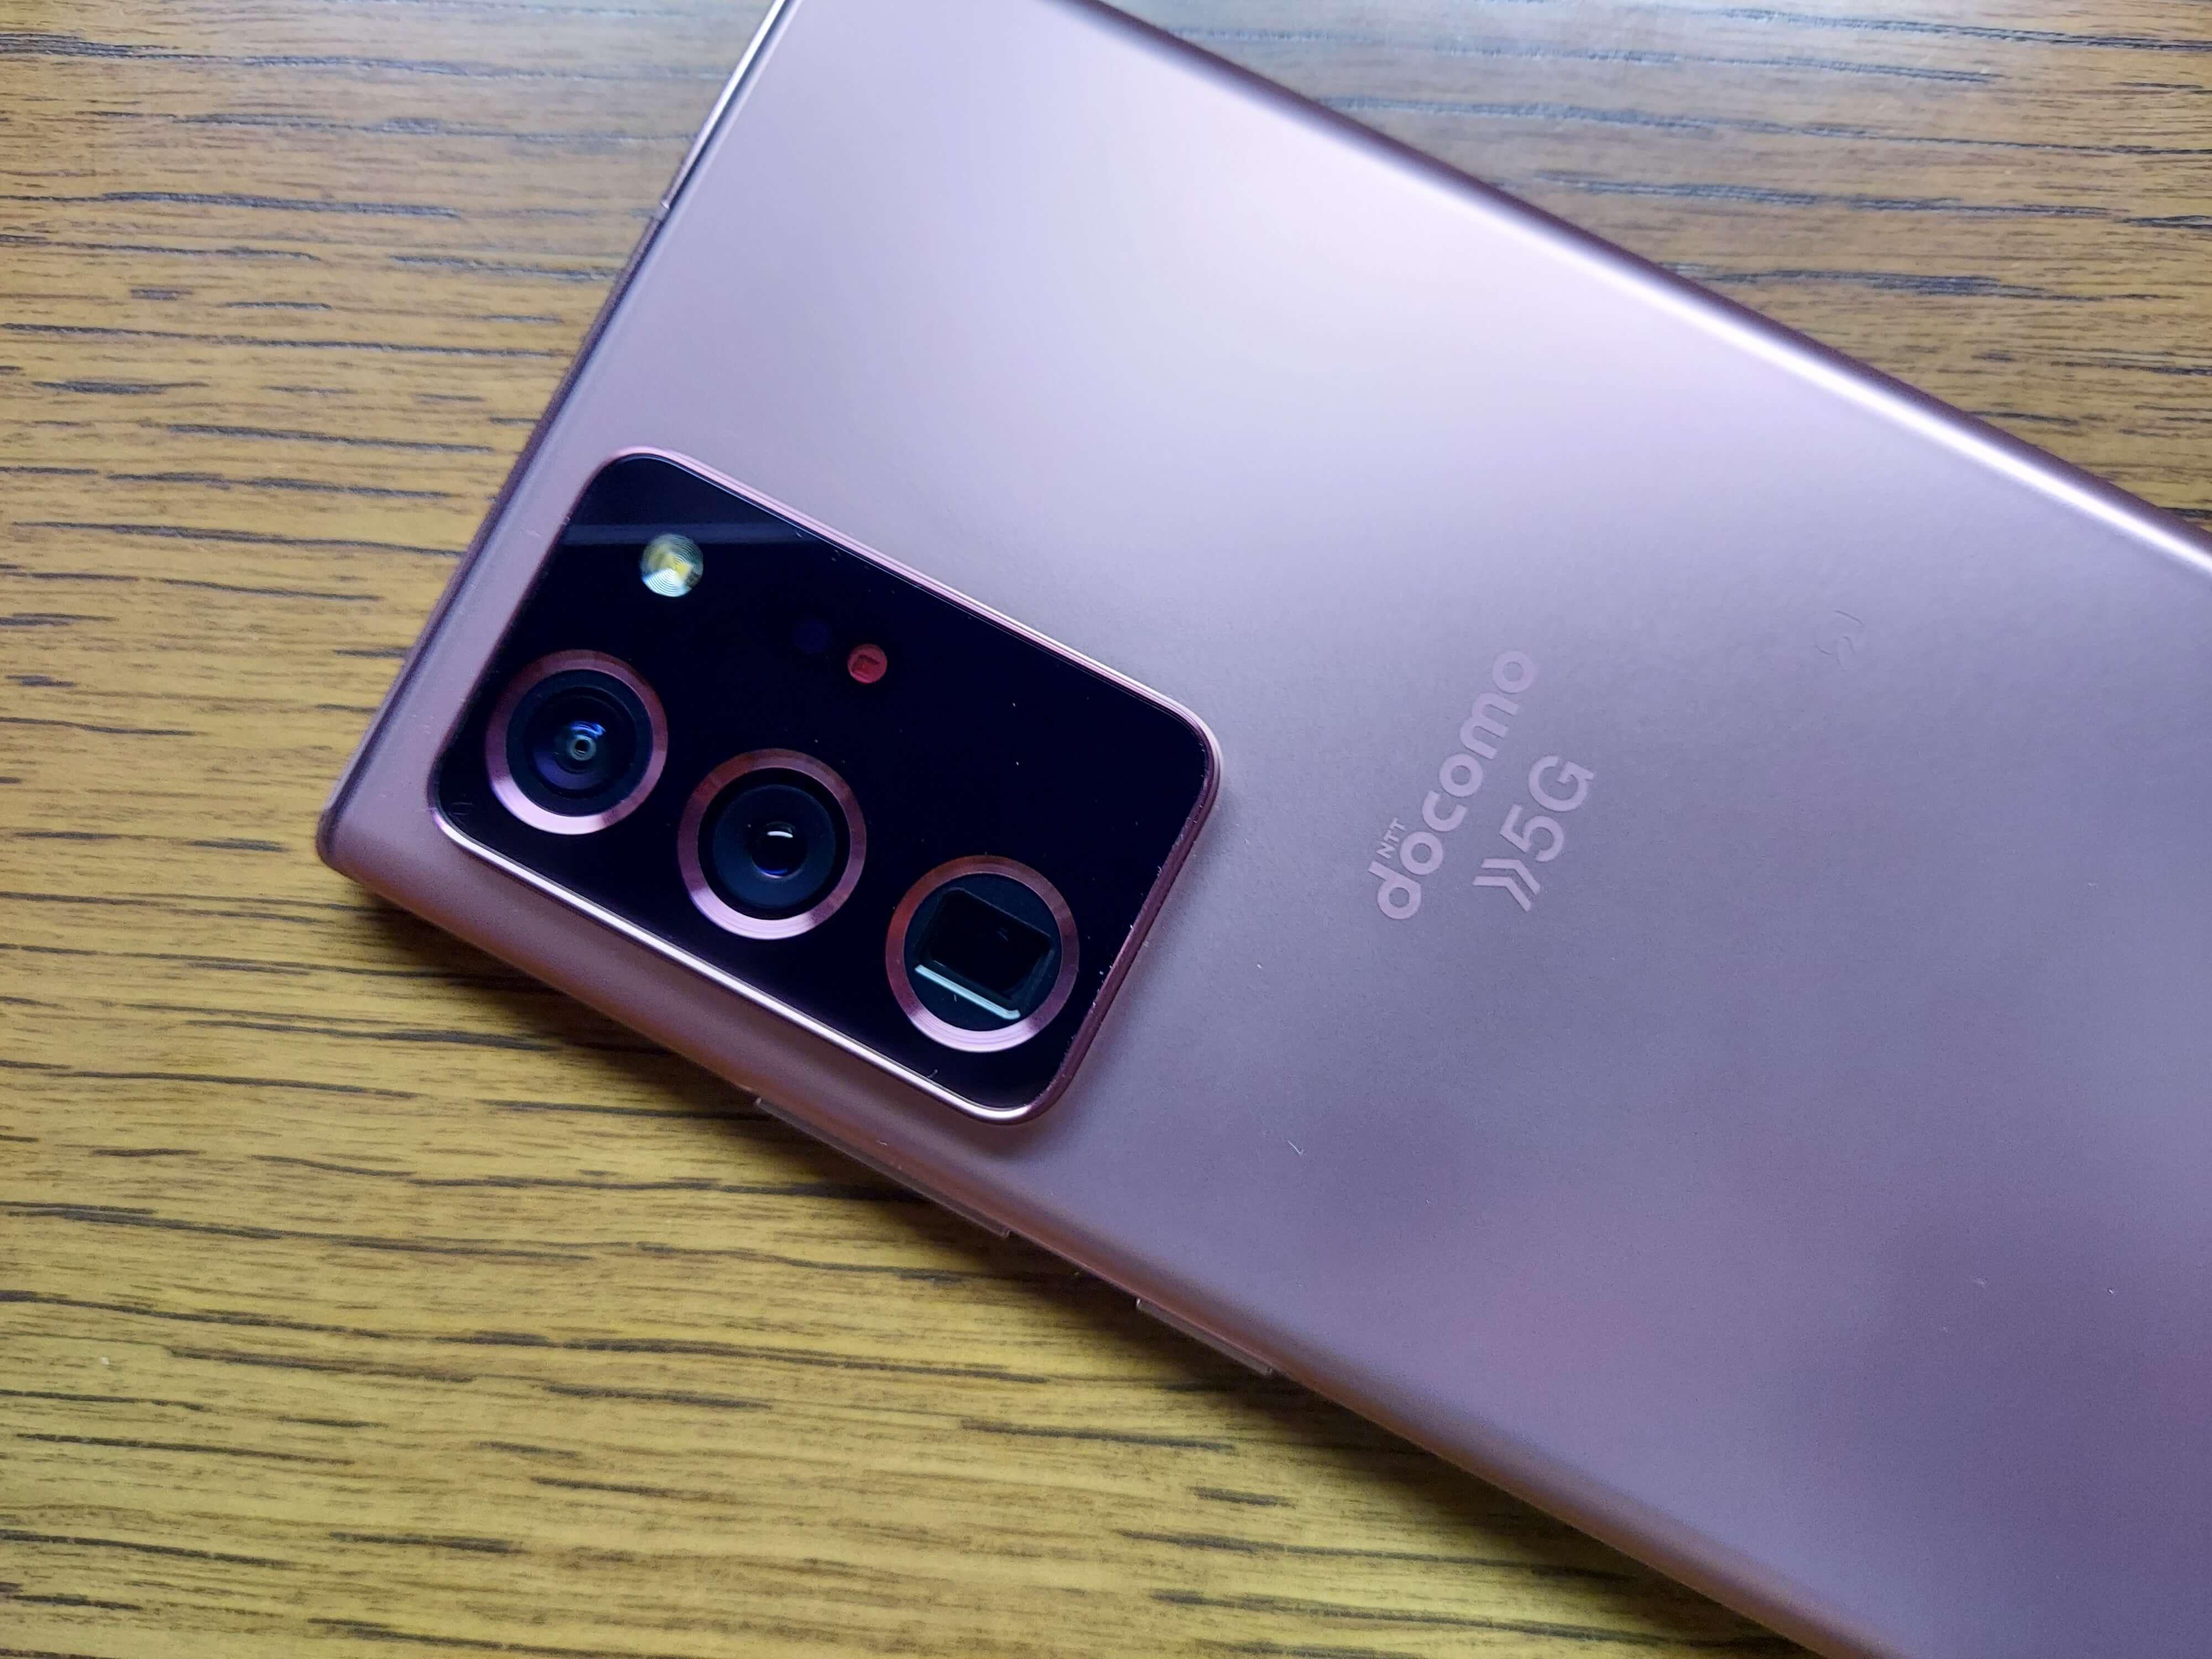 Galaxy Note20 Ultra 5Gはトリプルカメラ搭載